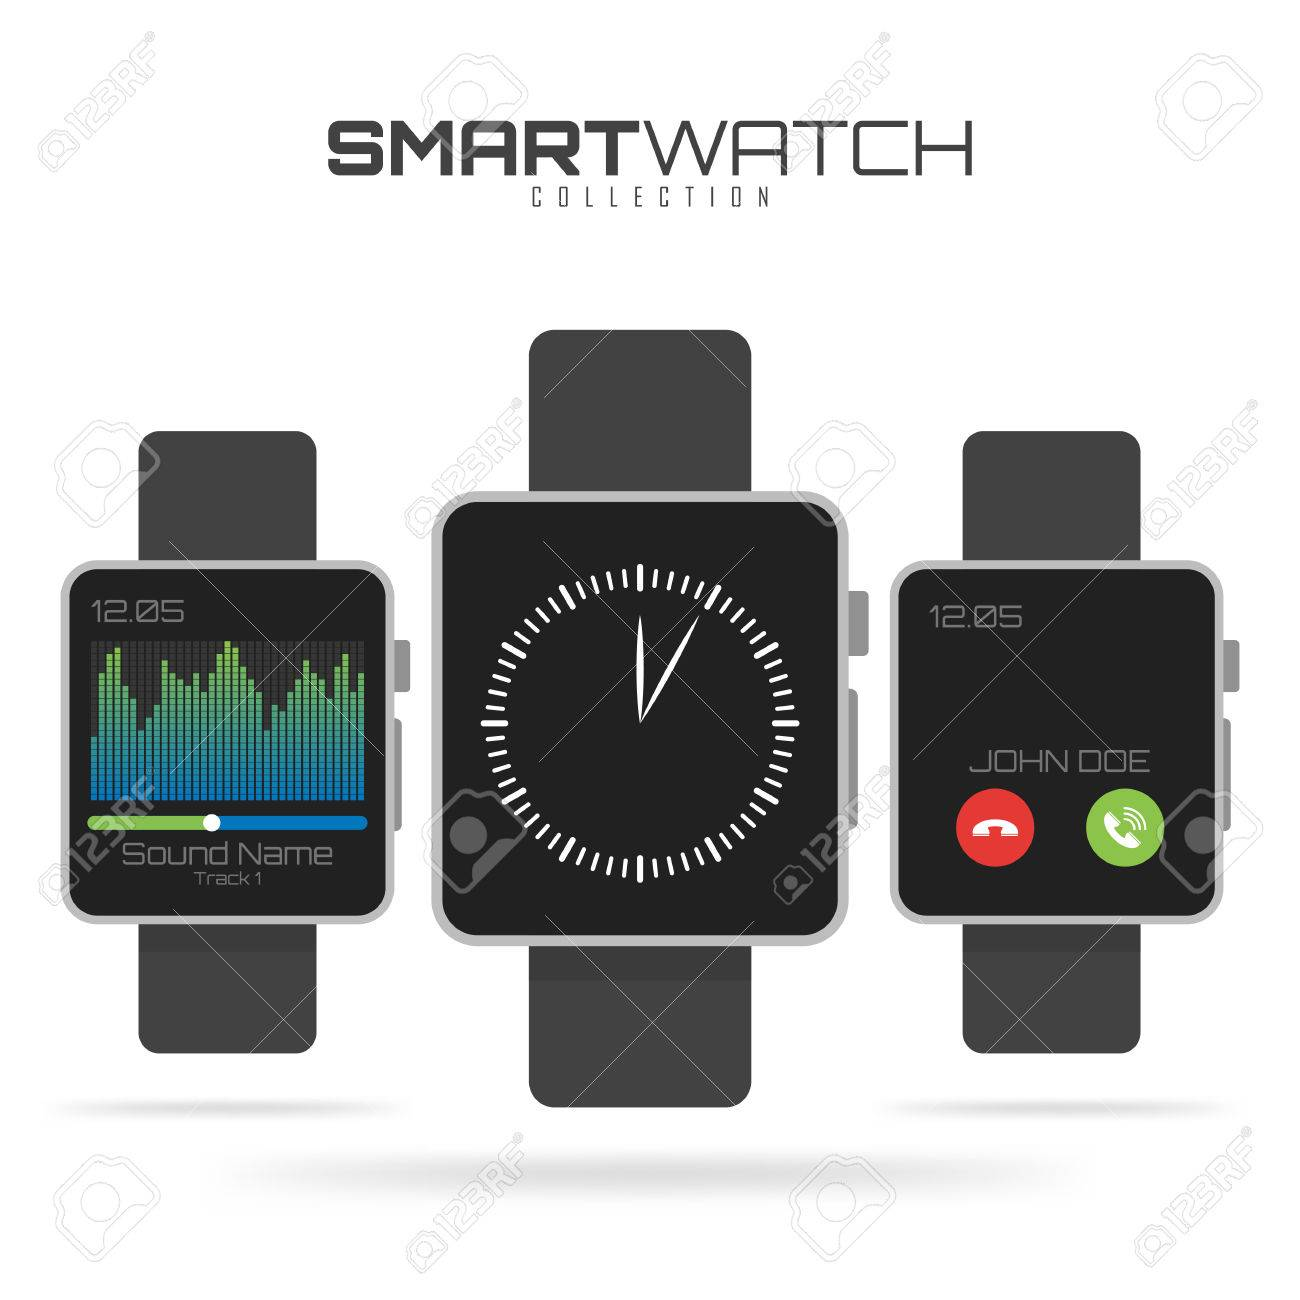 Conjunto De Diferentes Tipos De Relojes Inteligentes Futuras